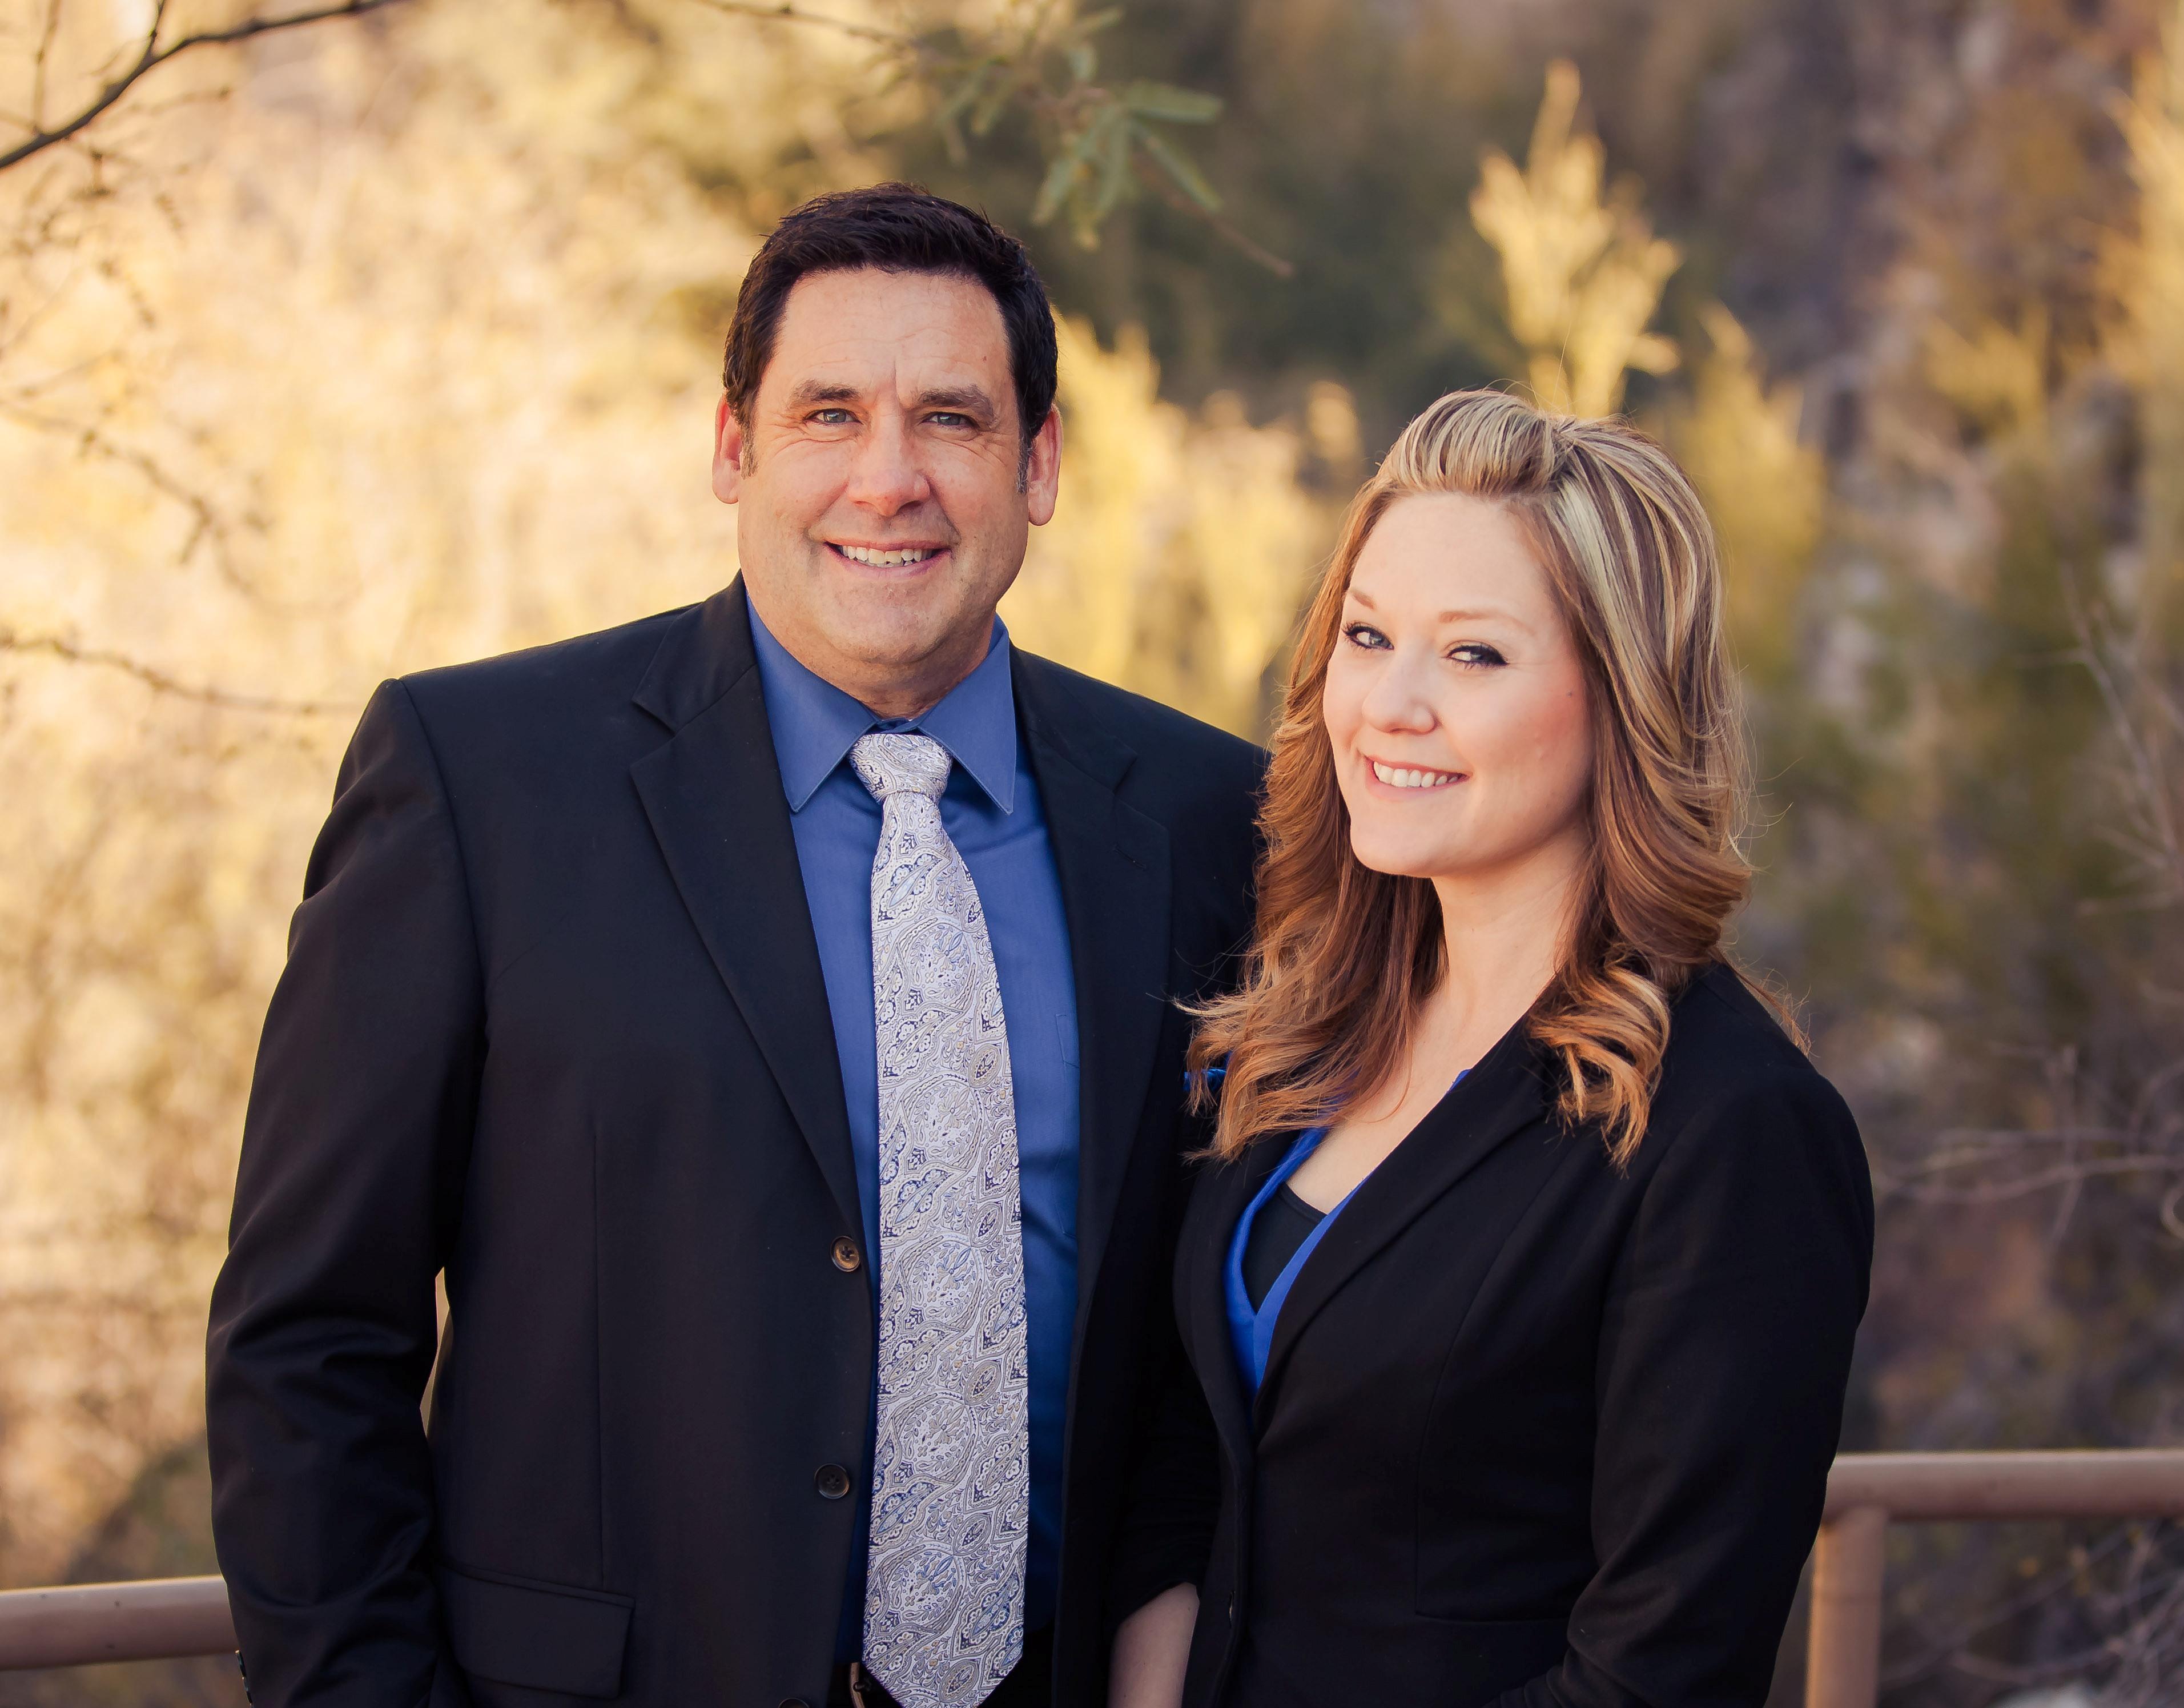 Don Eugene and Ashley Kimberlin